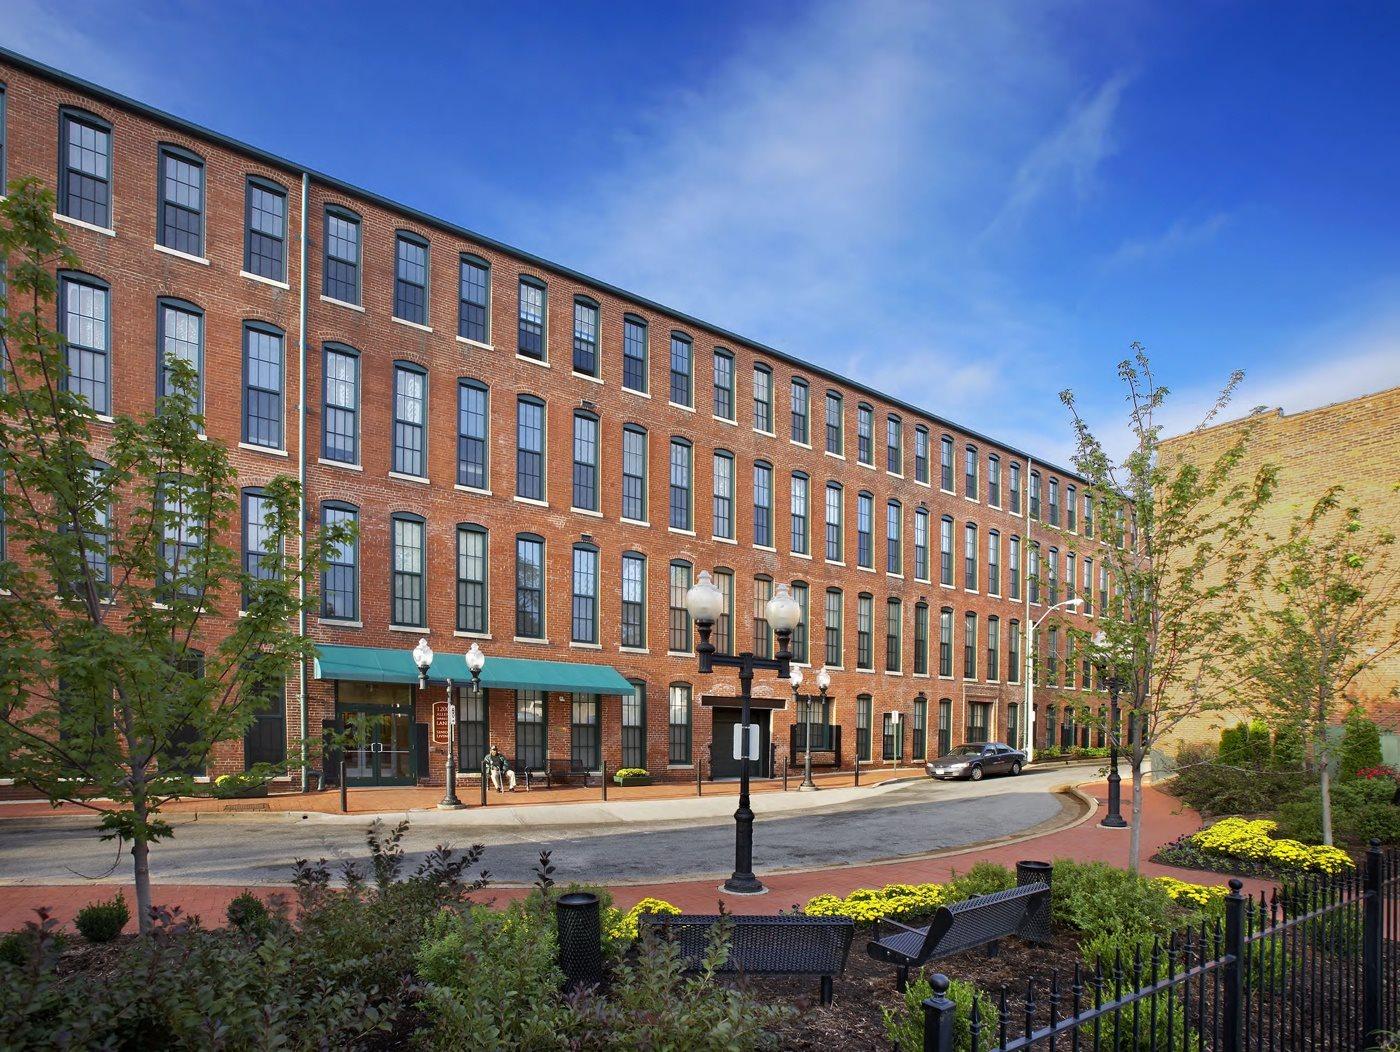 Street view of apartment building-Allen Market Lane Apartments, St. Louis, MO